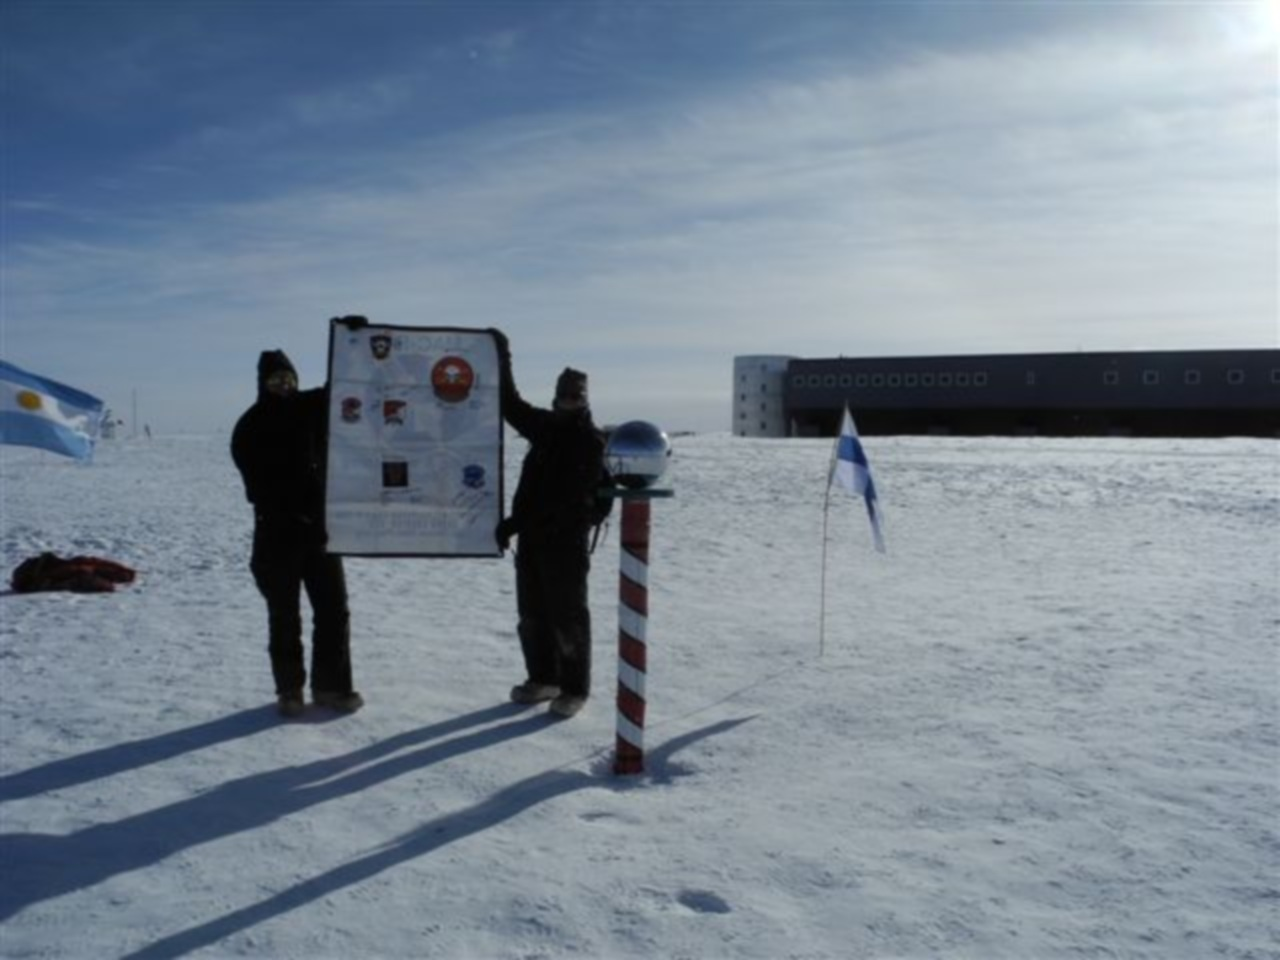 Antarctica - South Pole 006